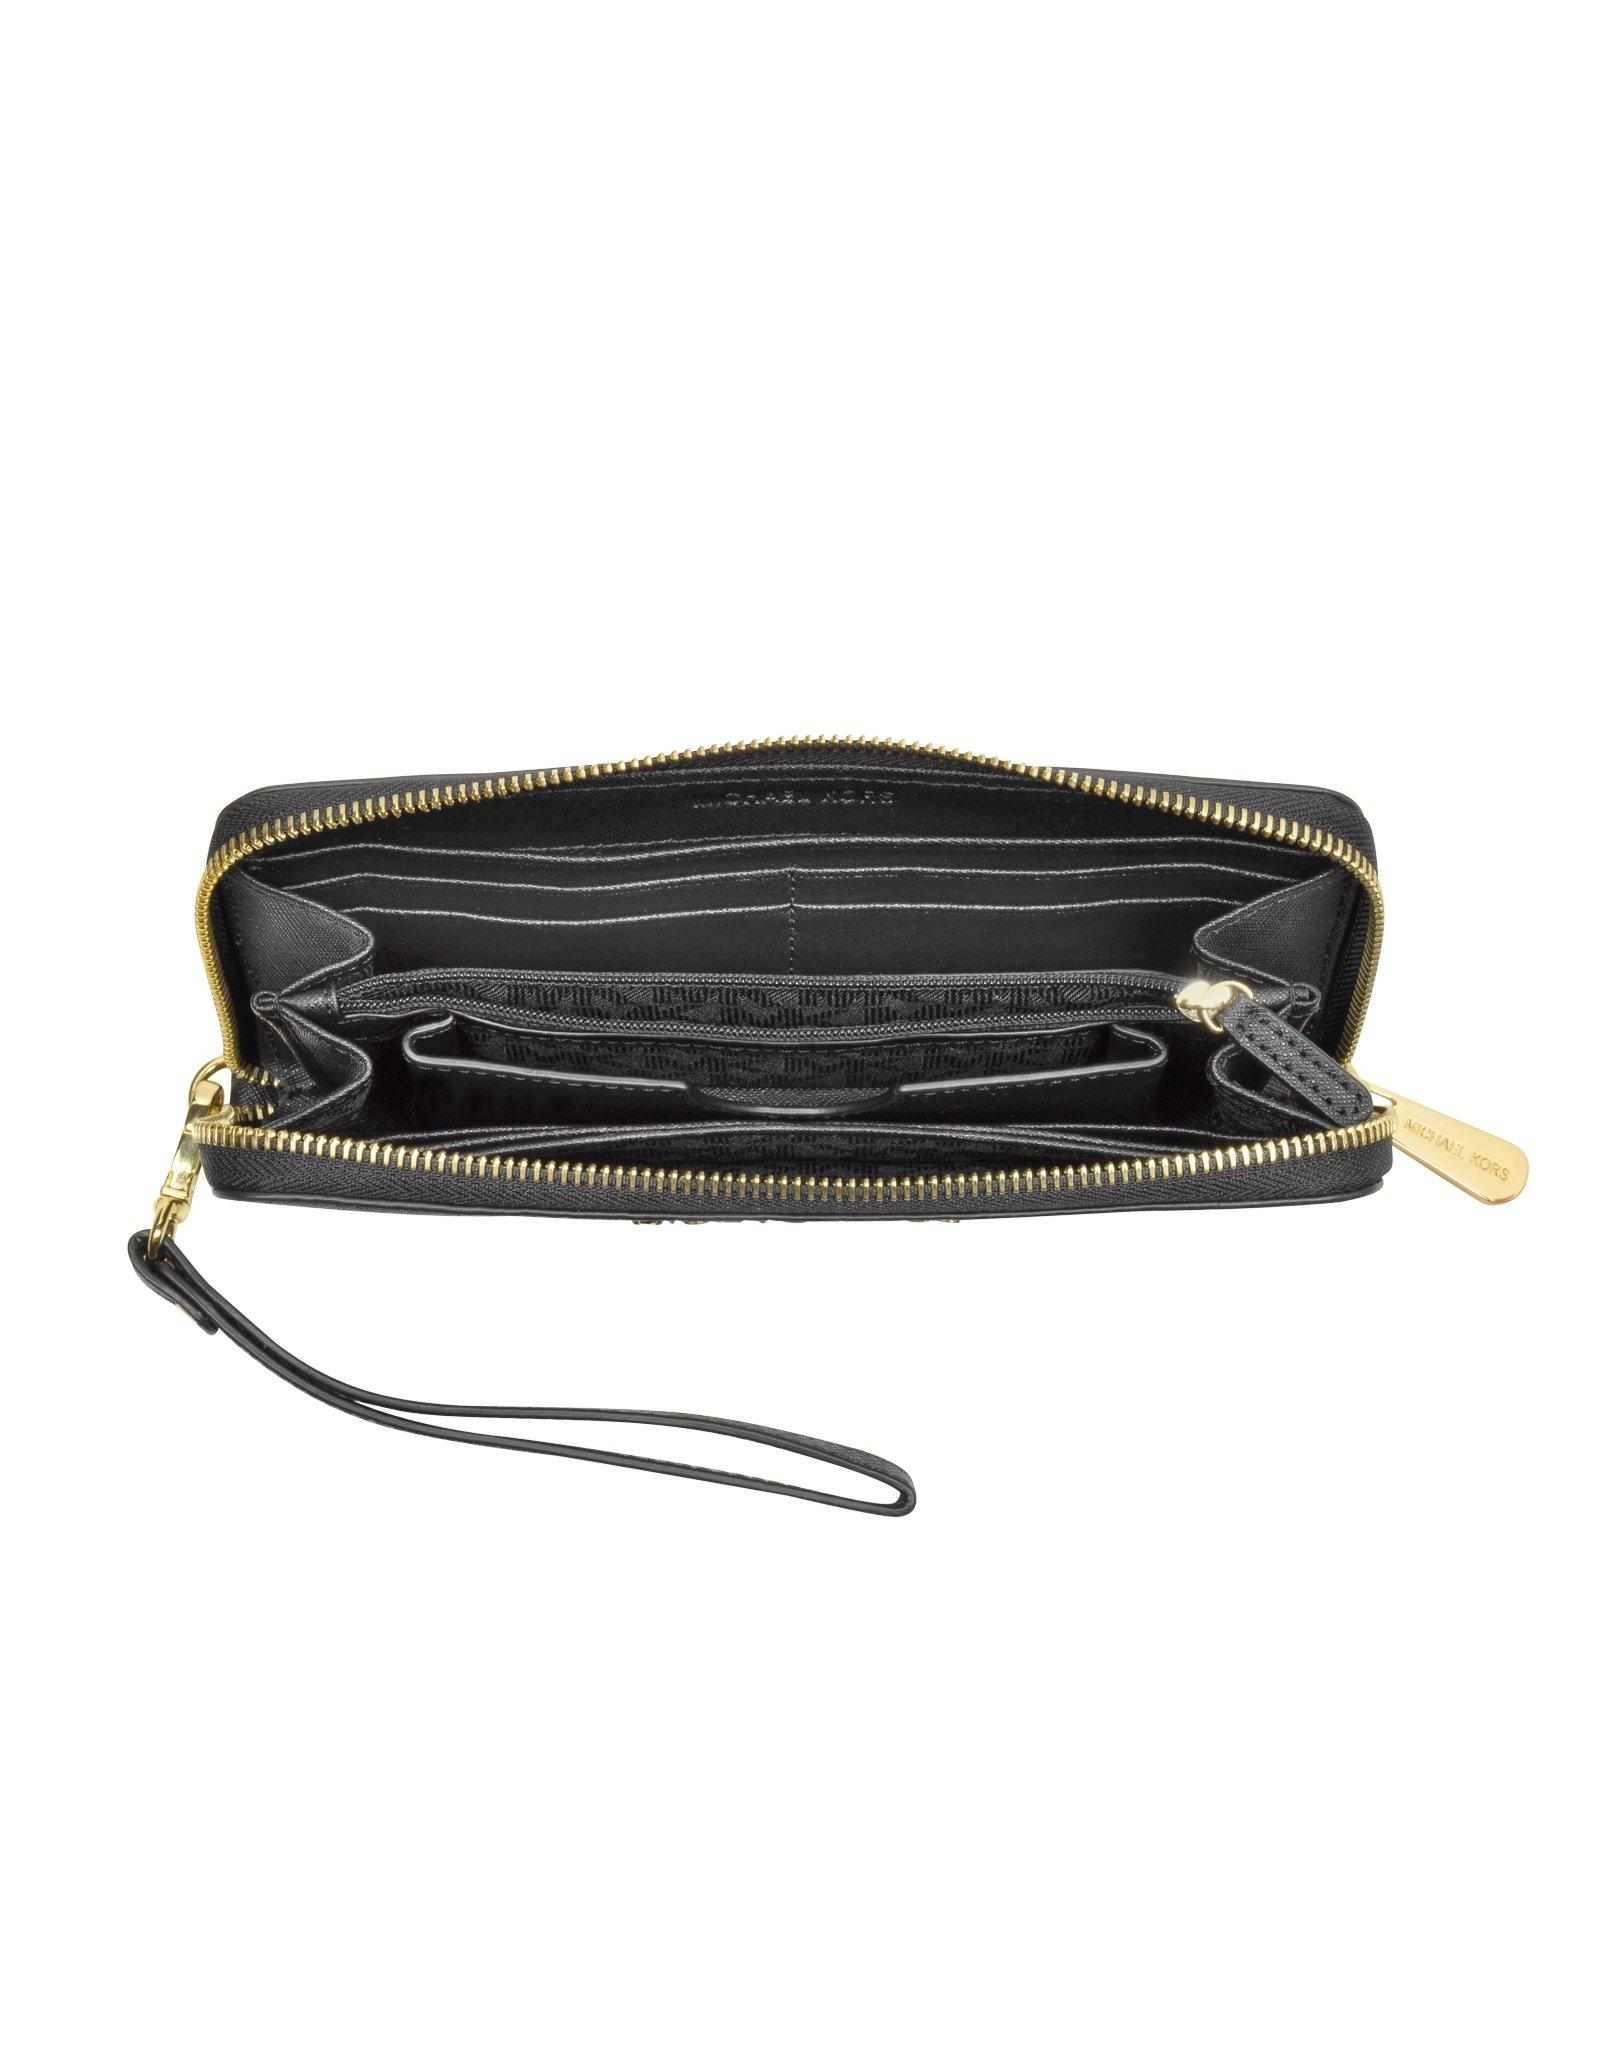 e331c83a5bb9 Michael Kors Jet Set Travel Black Saffiano Leather Tech Continental ...